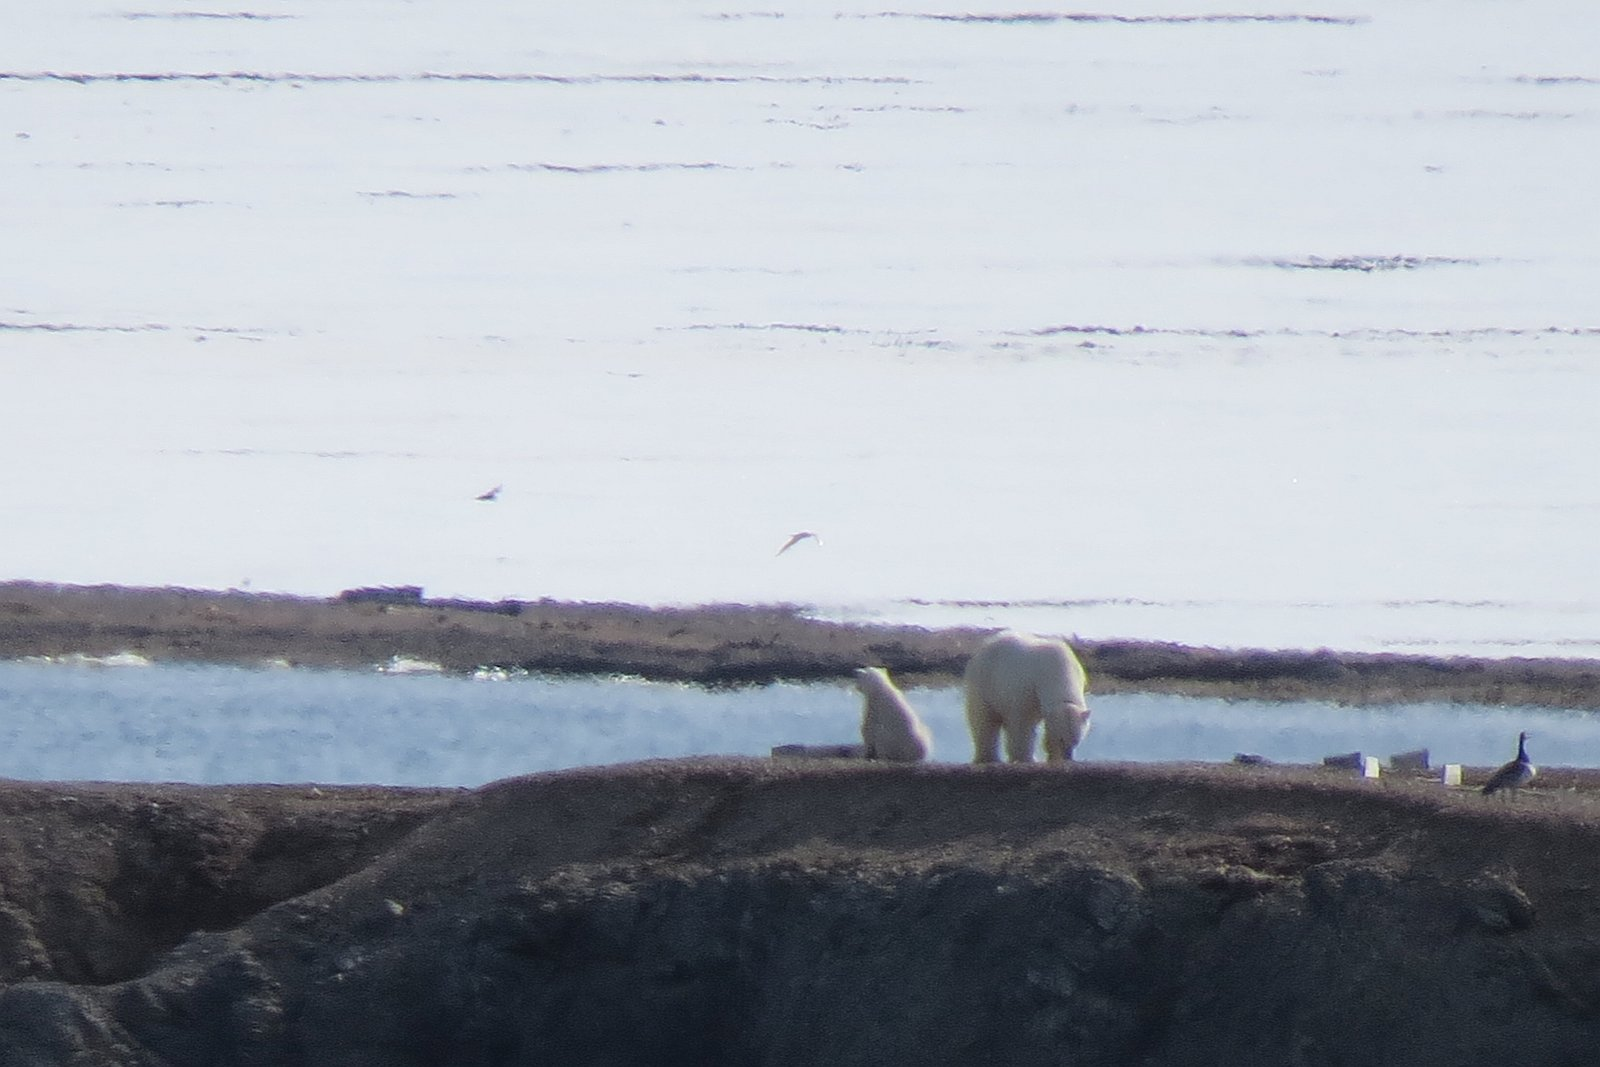 Polar bear with cub (Photo: Marie Dankworth und Lydia Messingfeld)